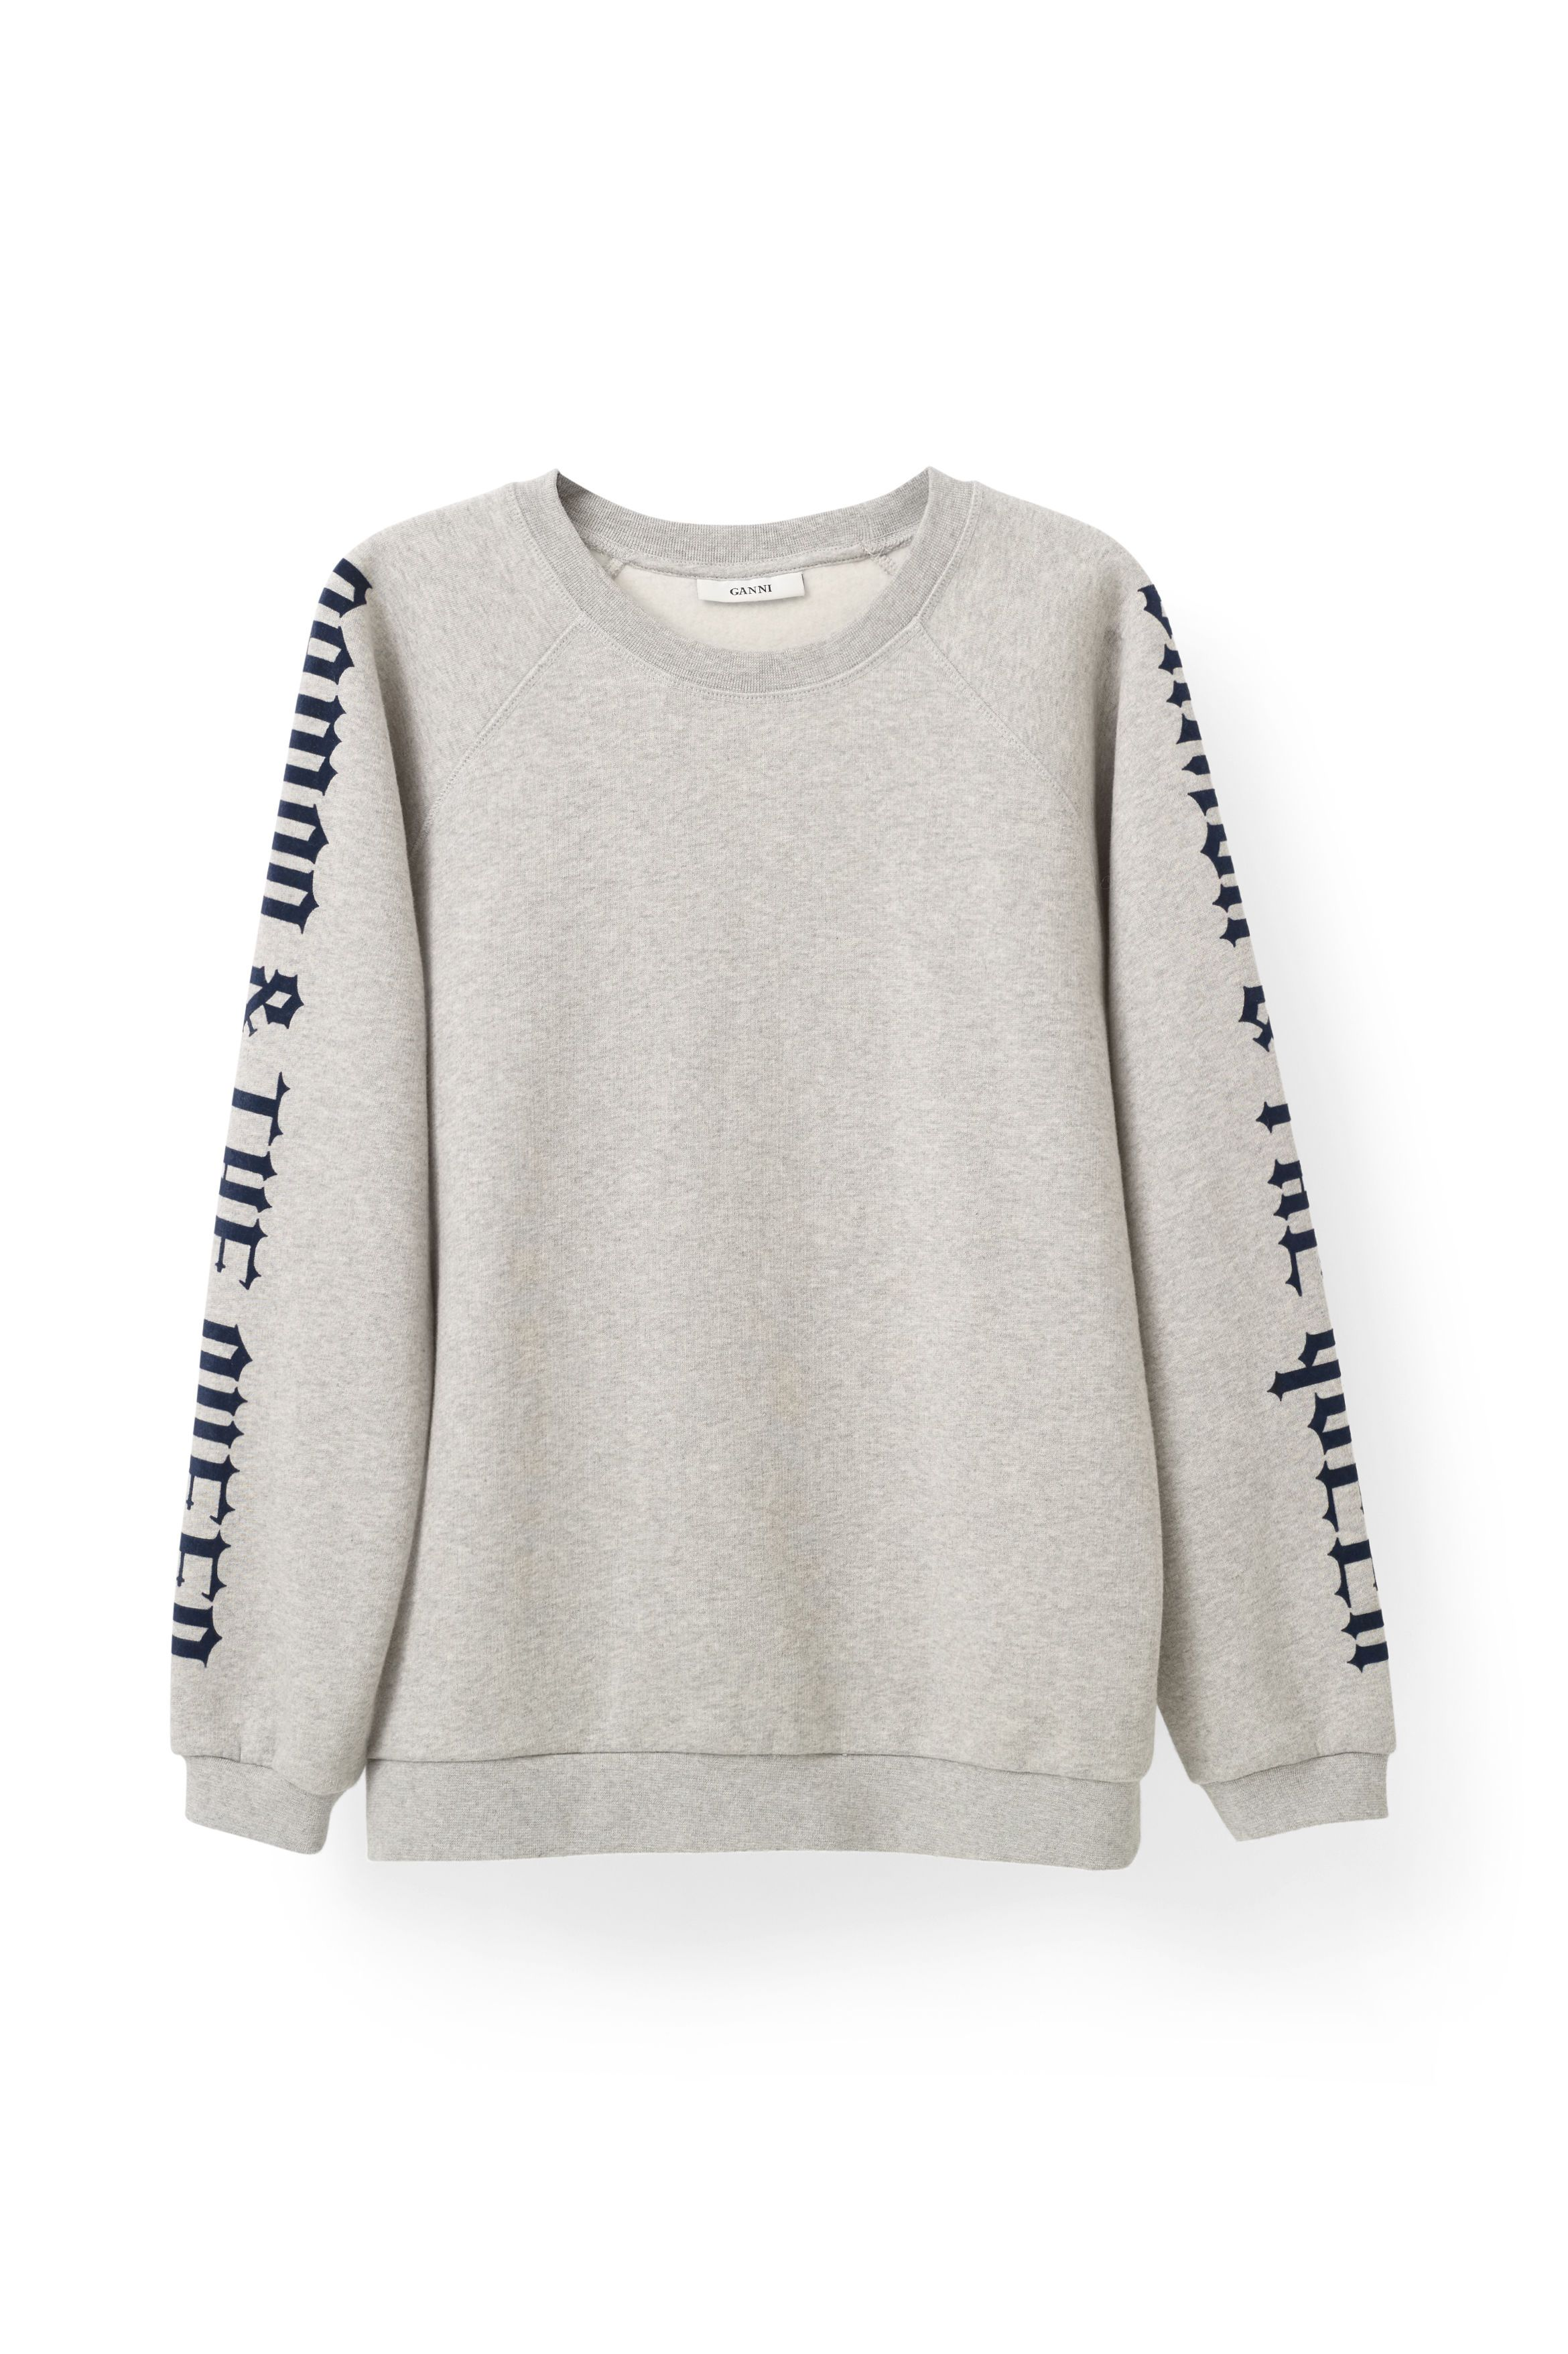 O Neill Isoli Sweatshirt Damon The Queen Ganni Sweatshirts Army Sweatshirts Printed Sweatshirts [ 3512 x 2340 Pixel ]